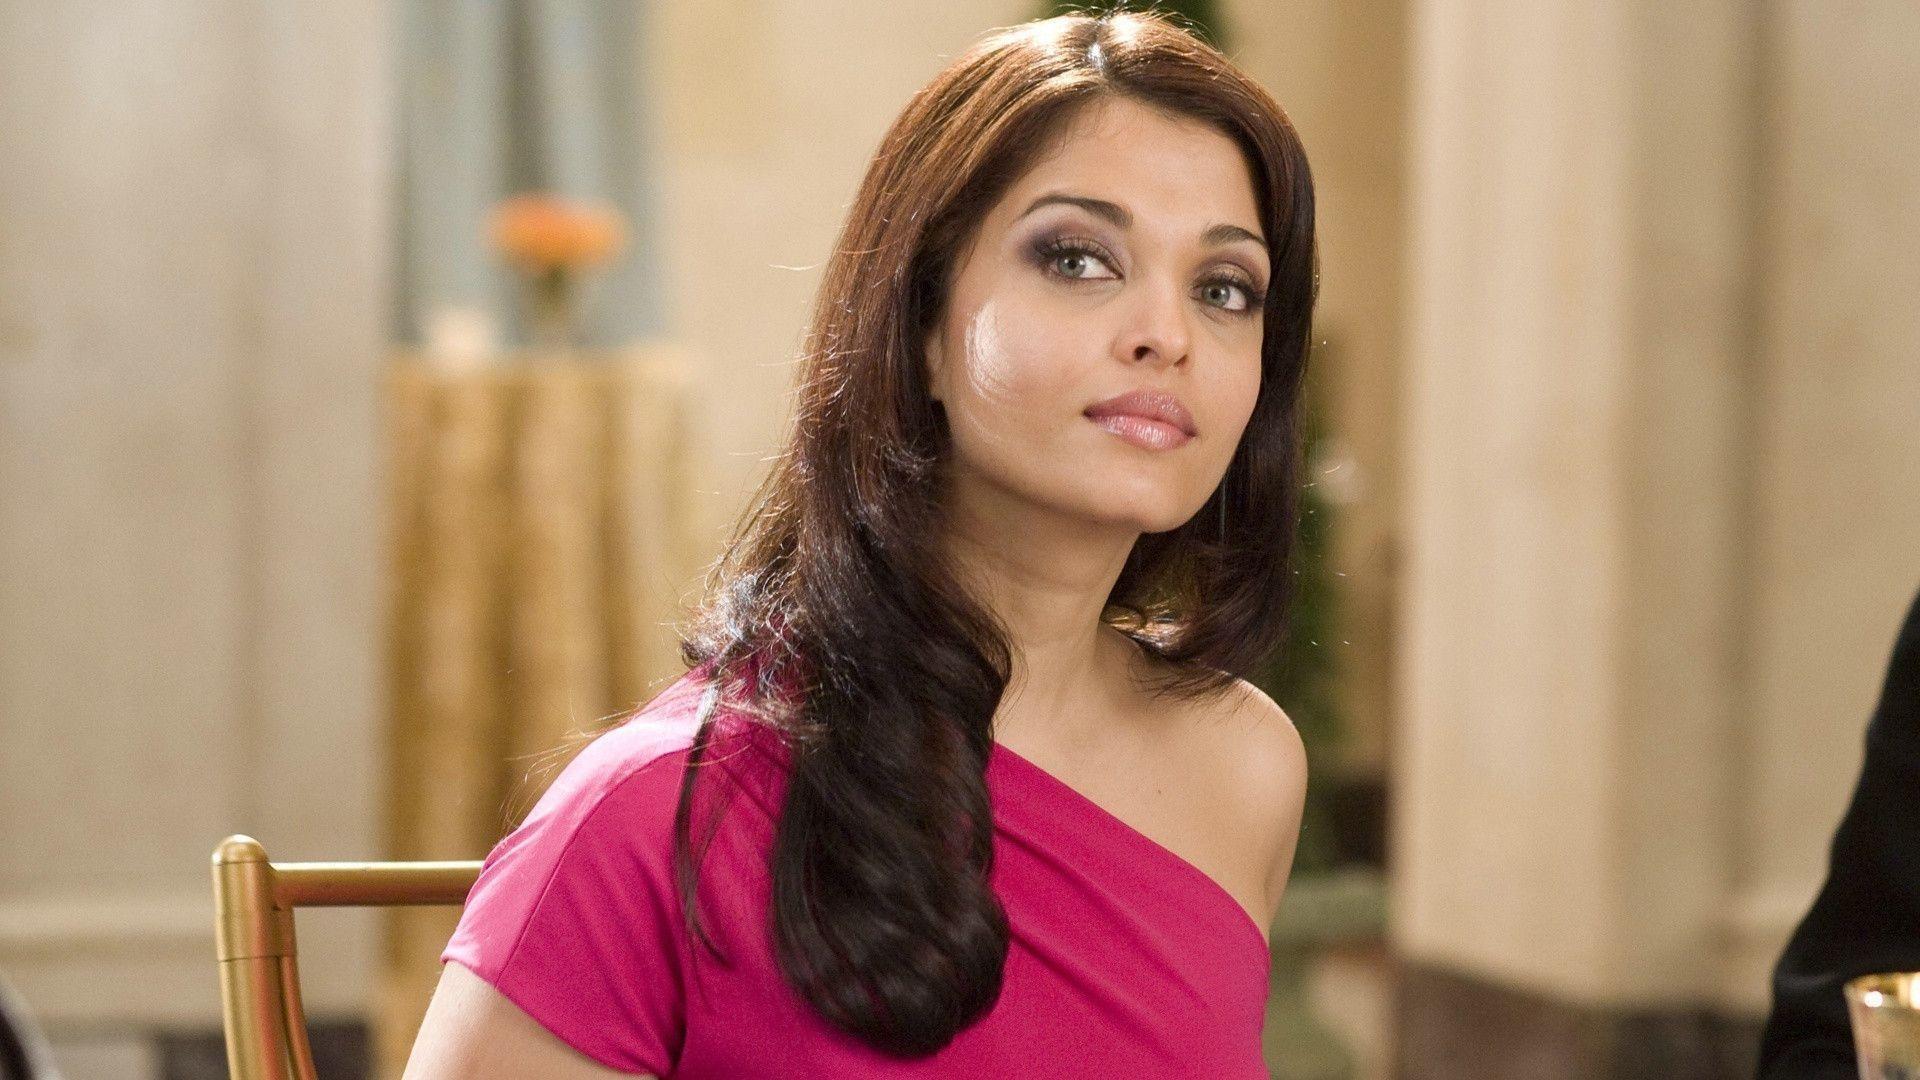 Full Hd Wallpapers Bollywood Actress: Bollywood Actress Wallpaper HD 2018 (74+ Images